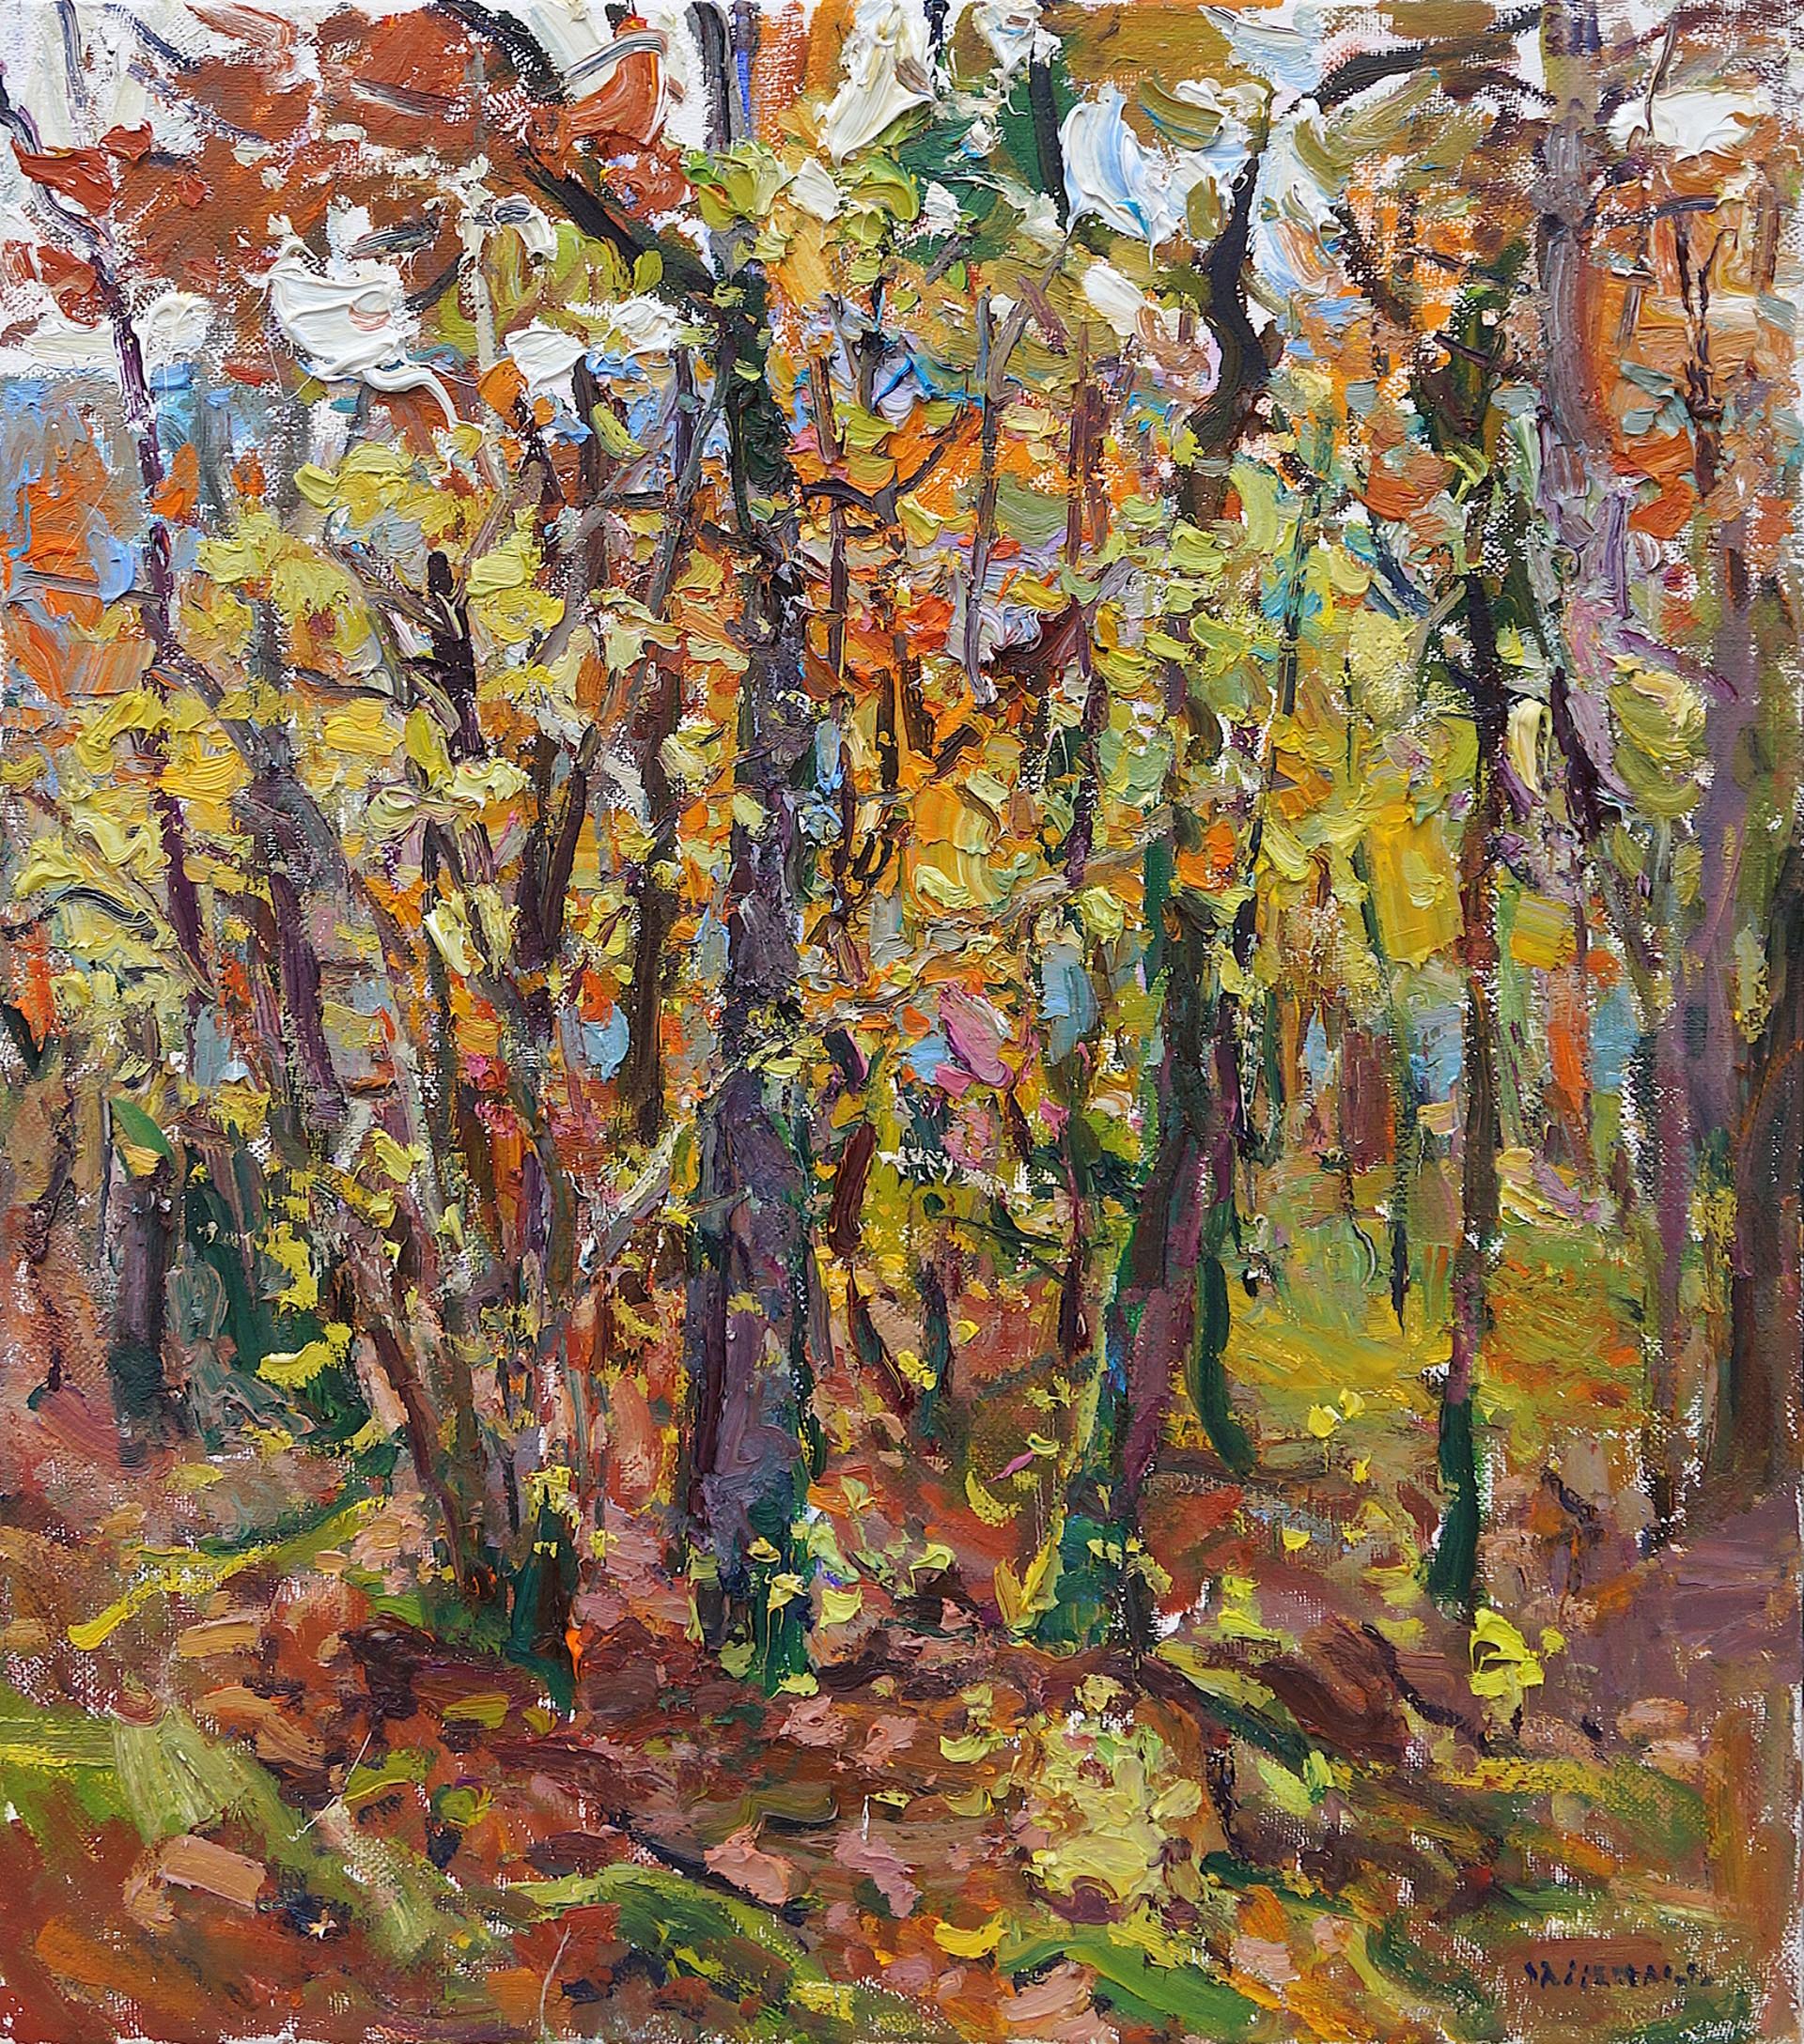 Forest in Autumn by Antonin Passemard